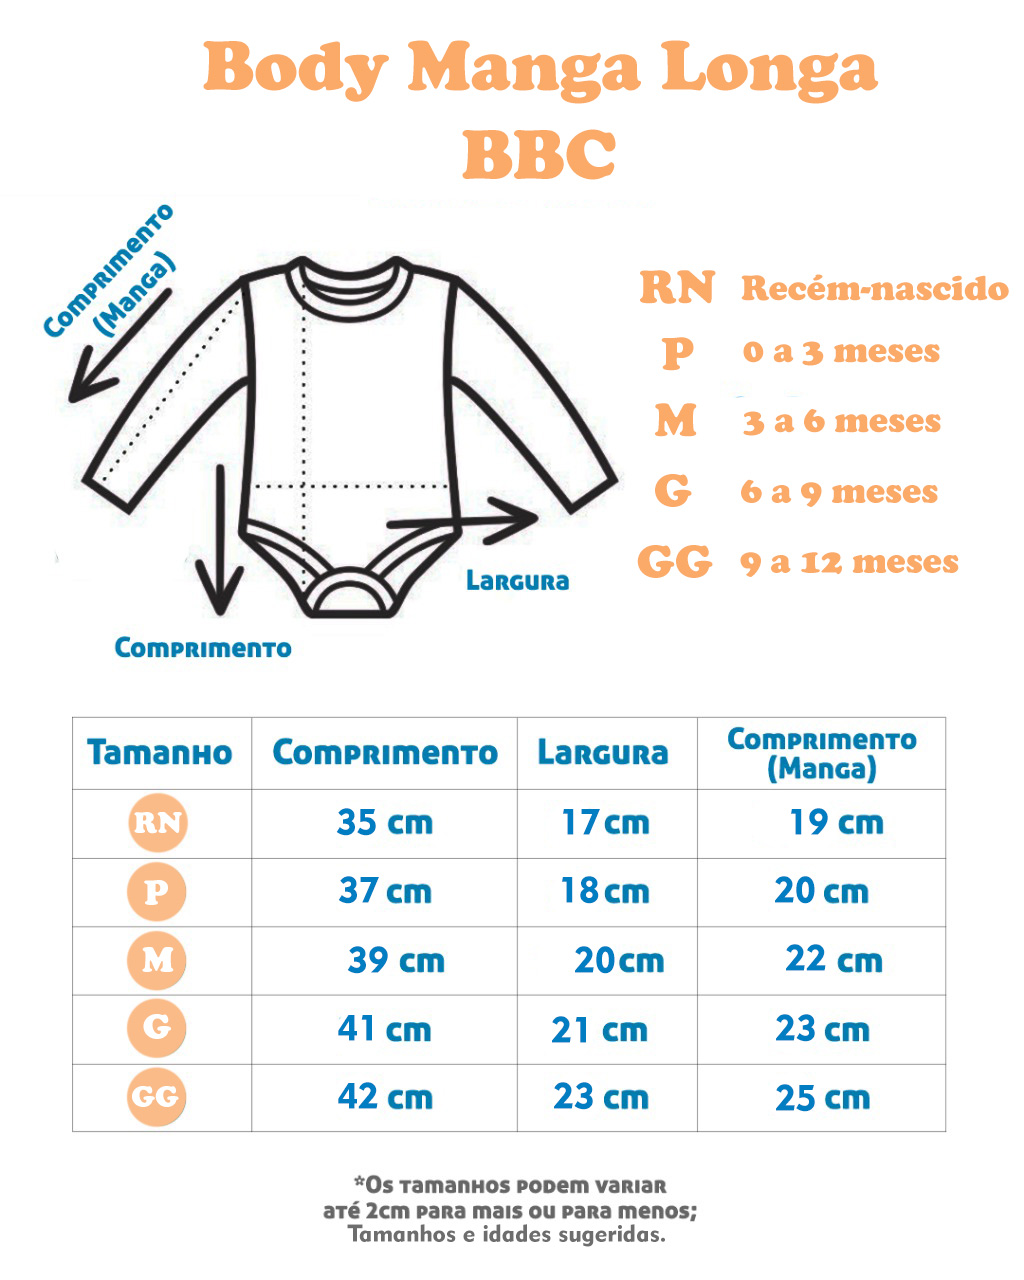 Body Manga Longa Estrelas (RN/P/M/G/GG)